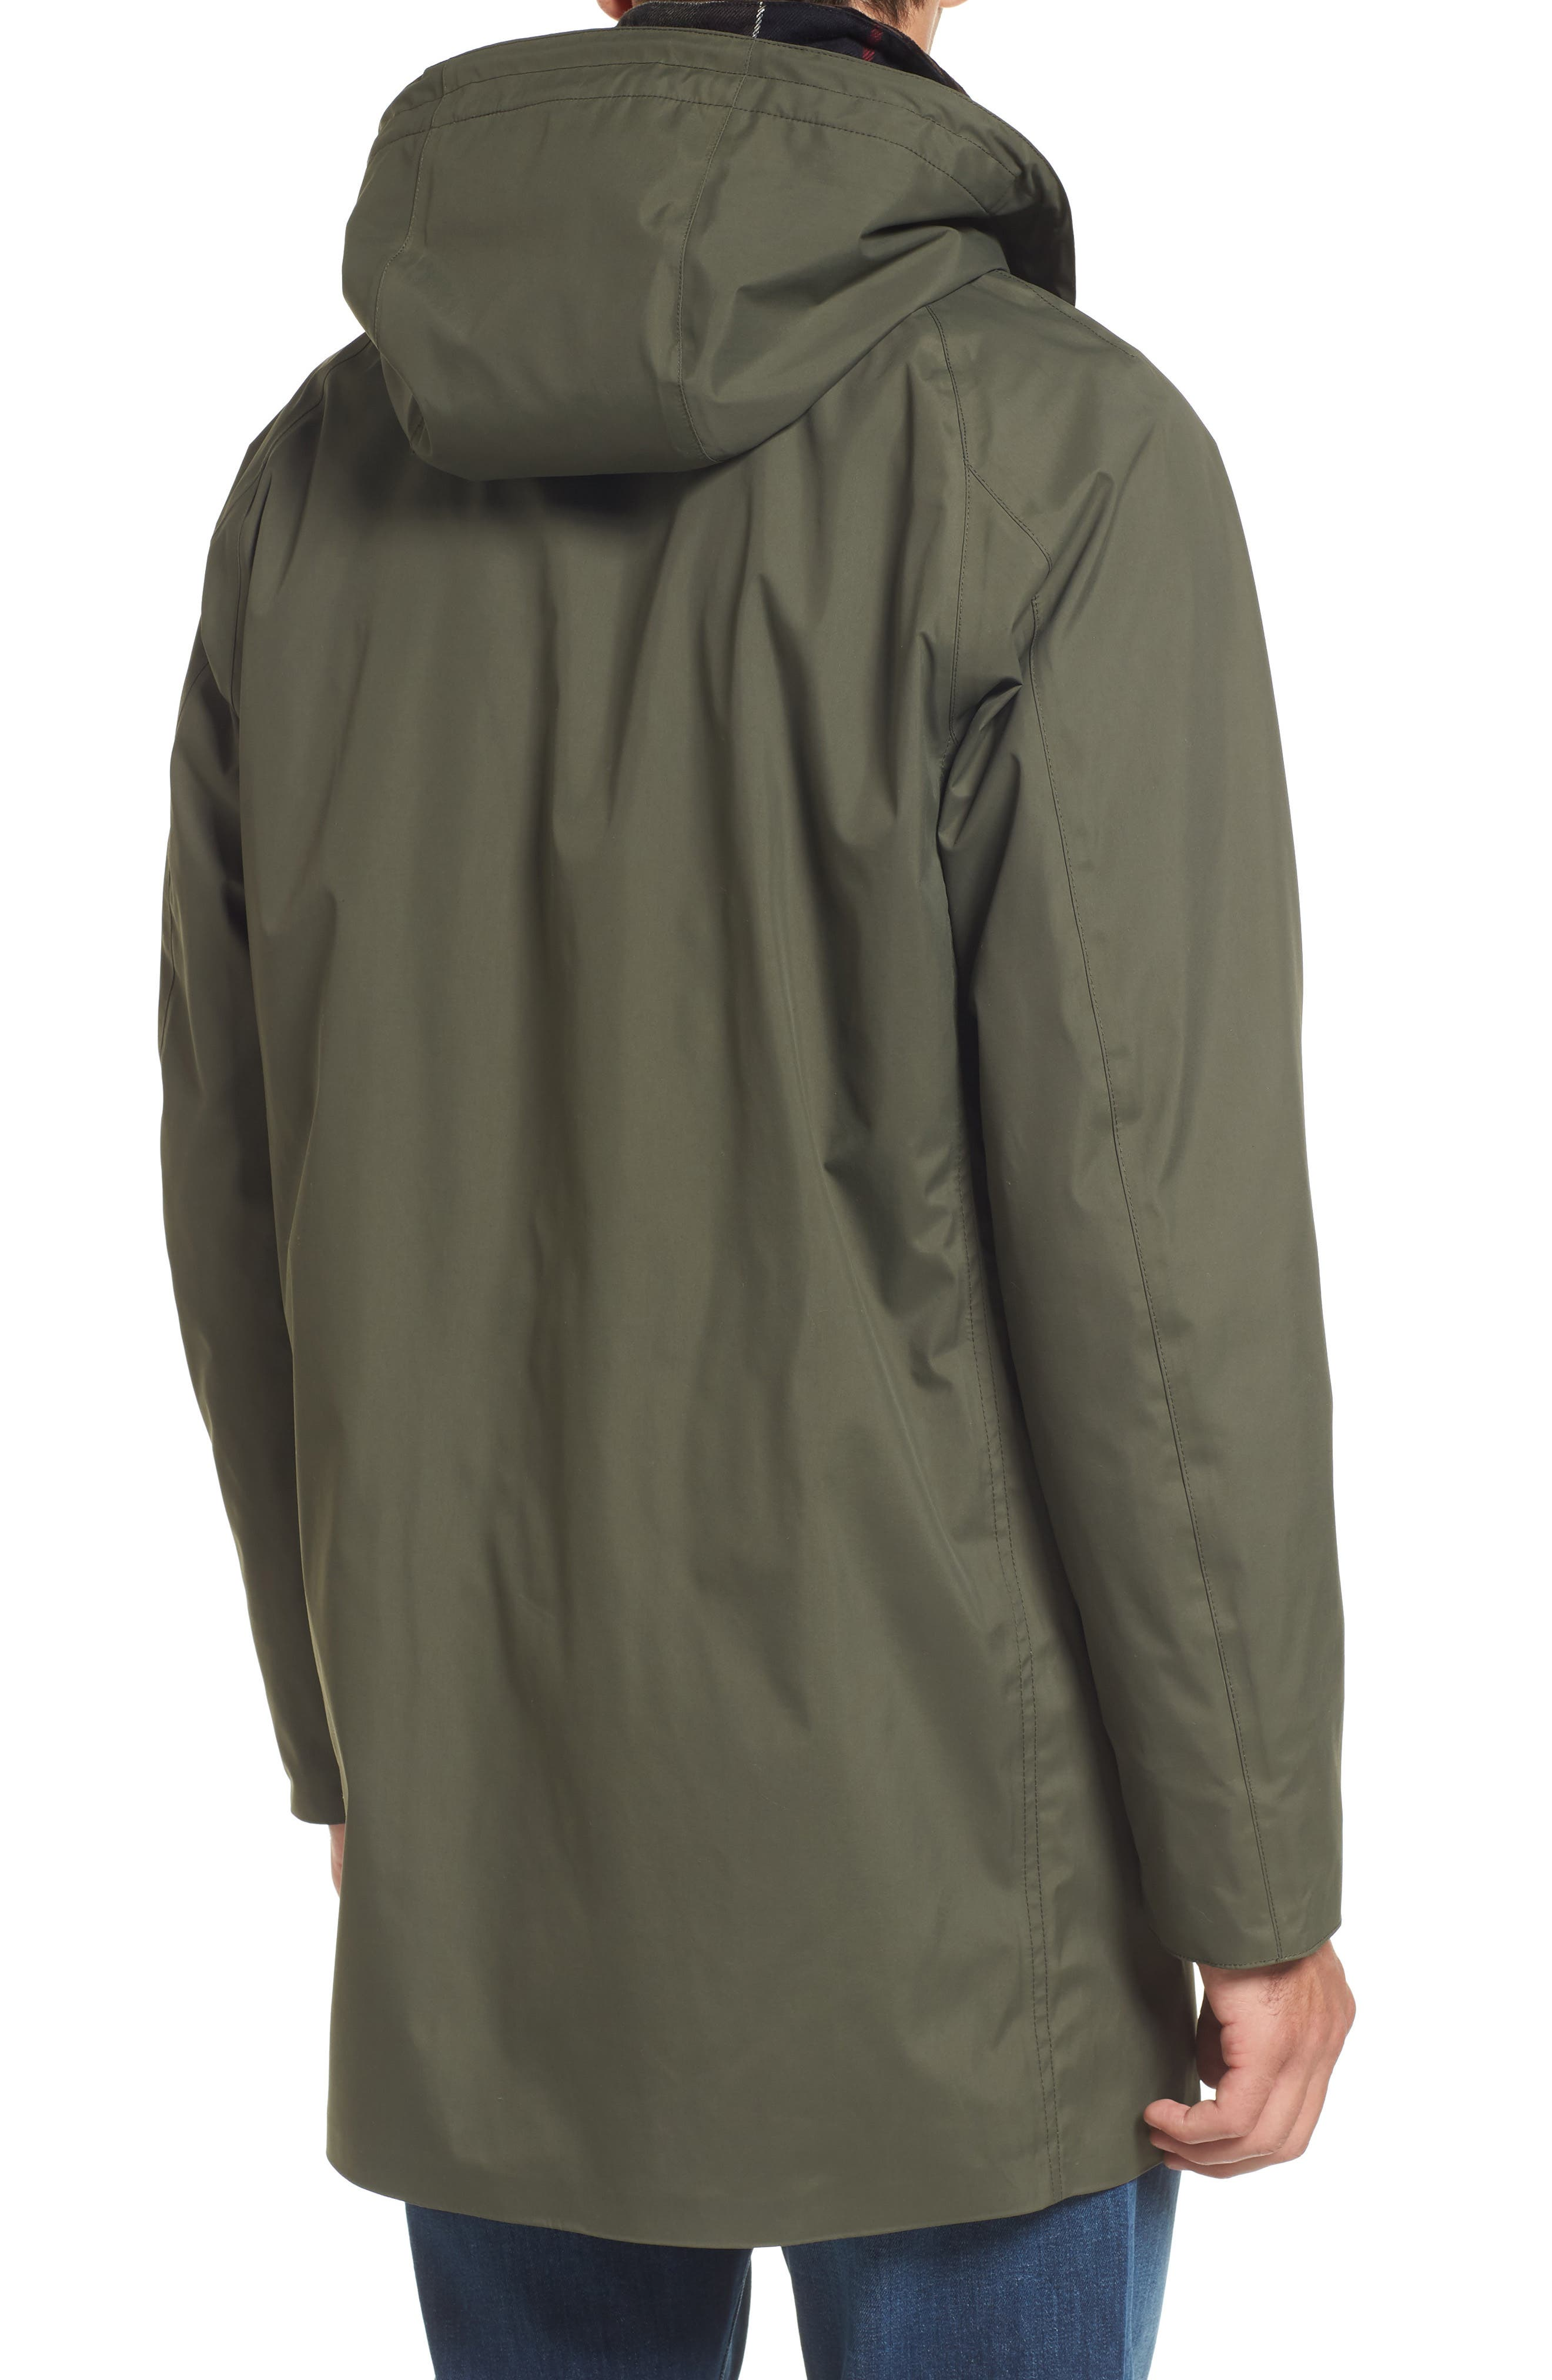 Scarisbrick Waterproof Jacket,                             Alternate thumbnail 2, color,                             340